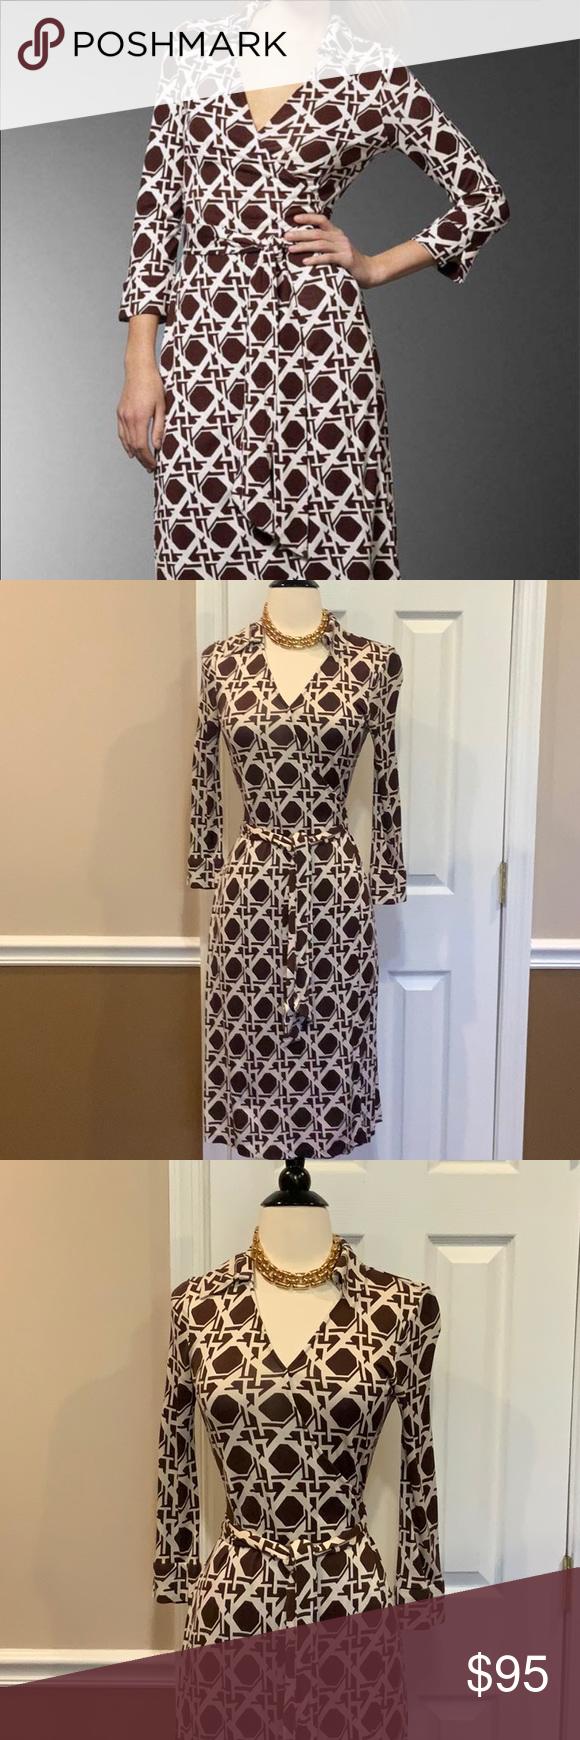 Dvf Vintage Justin Silk Wrap Dress 6 Diane Von Furstenberg Vintage Line Sz 6 100 Silk Classic Wrap Dress Bro Silk Wrap Dresses Clothes Design Colorful Dresses [ 1740 x 580 Pixel ]